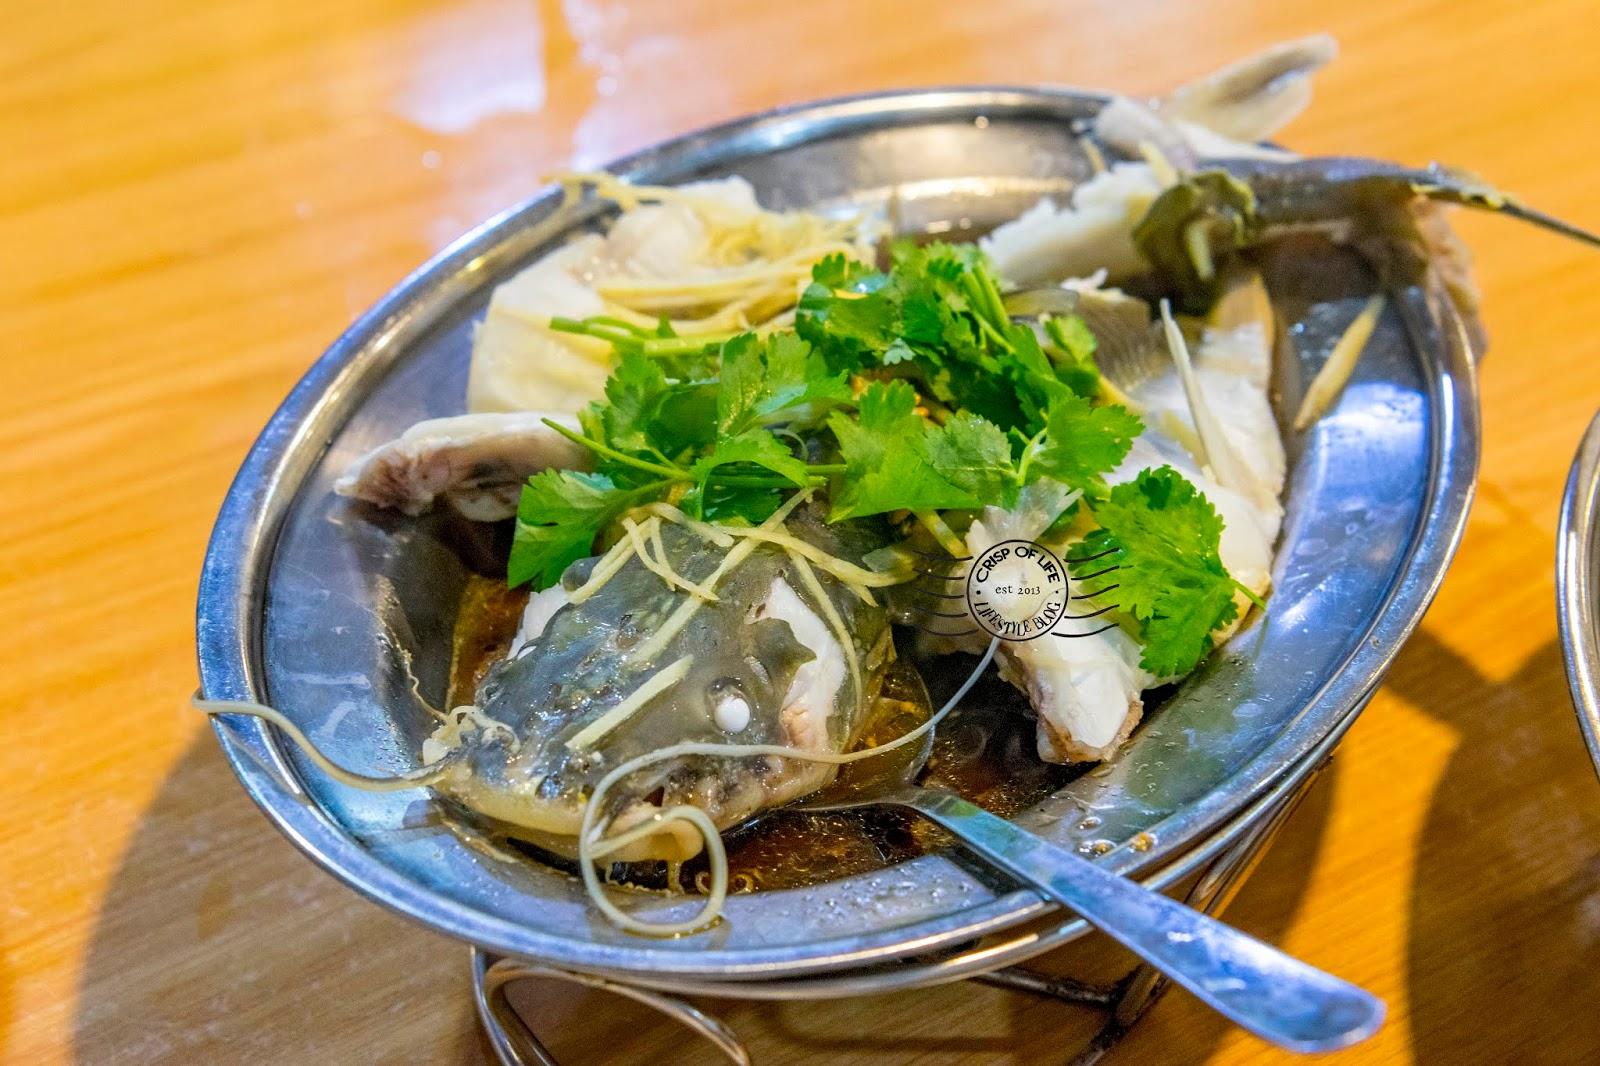 Kang Fresh Water Food 阿江中泰河海鮮 at Bagan Samak, Bandar Baharu, Kedah